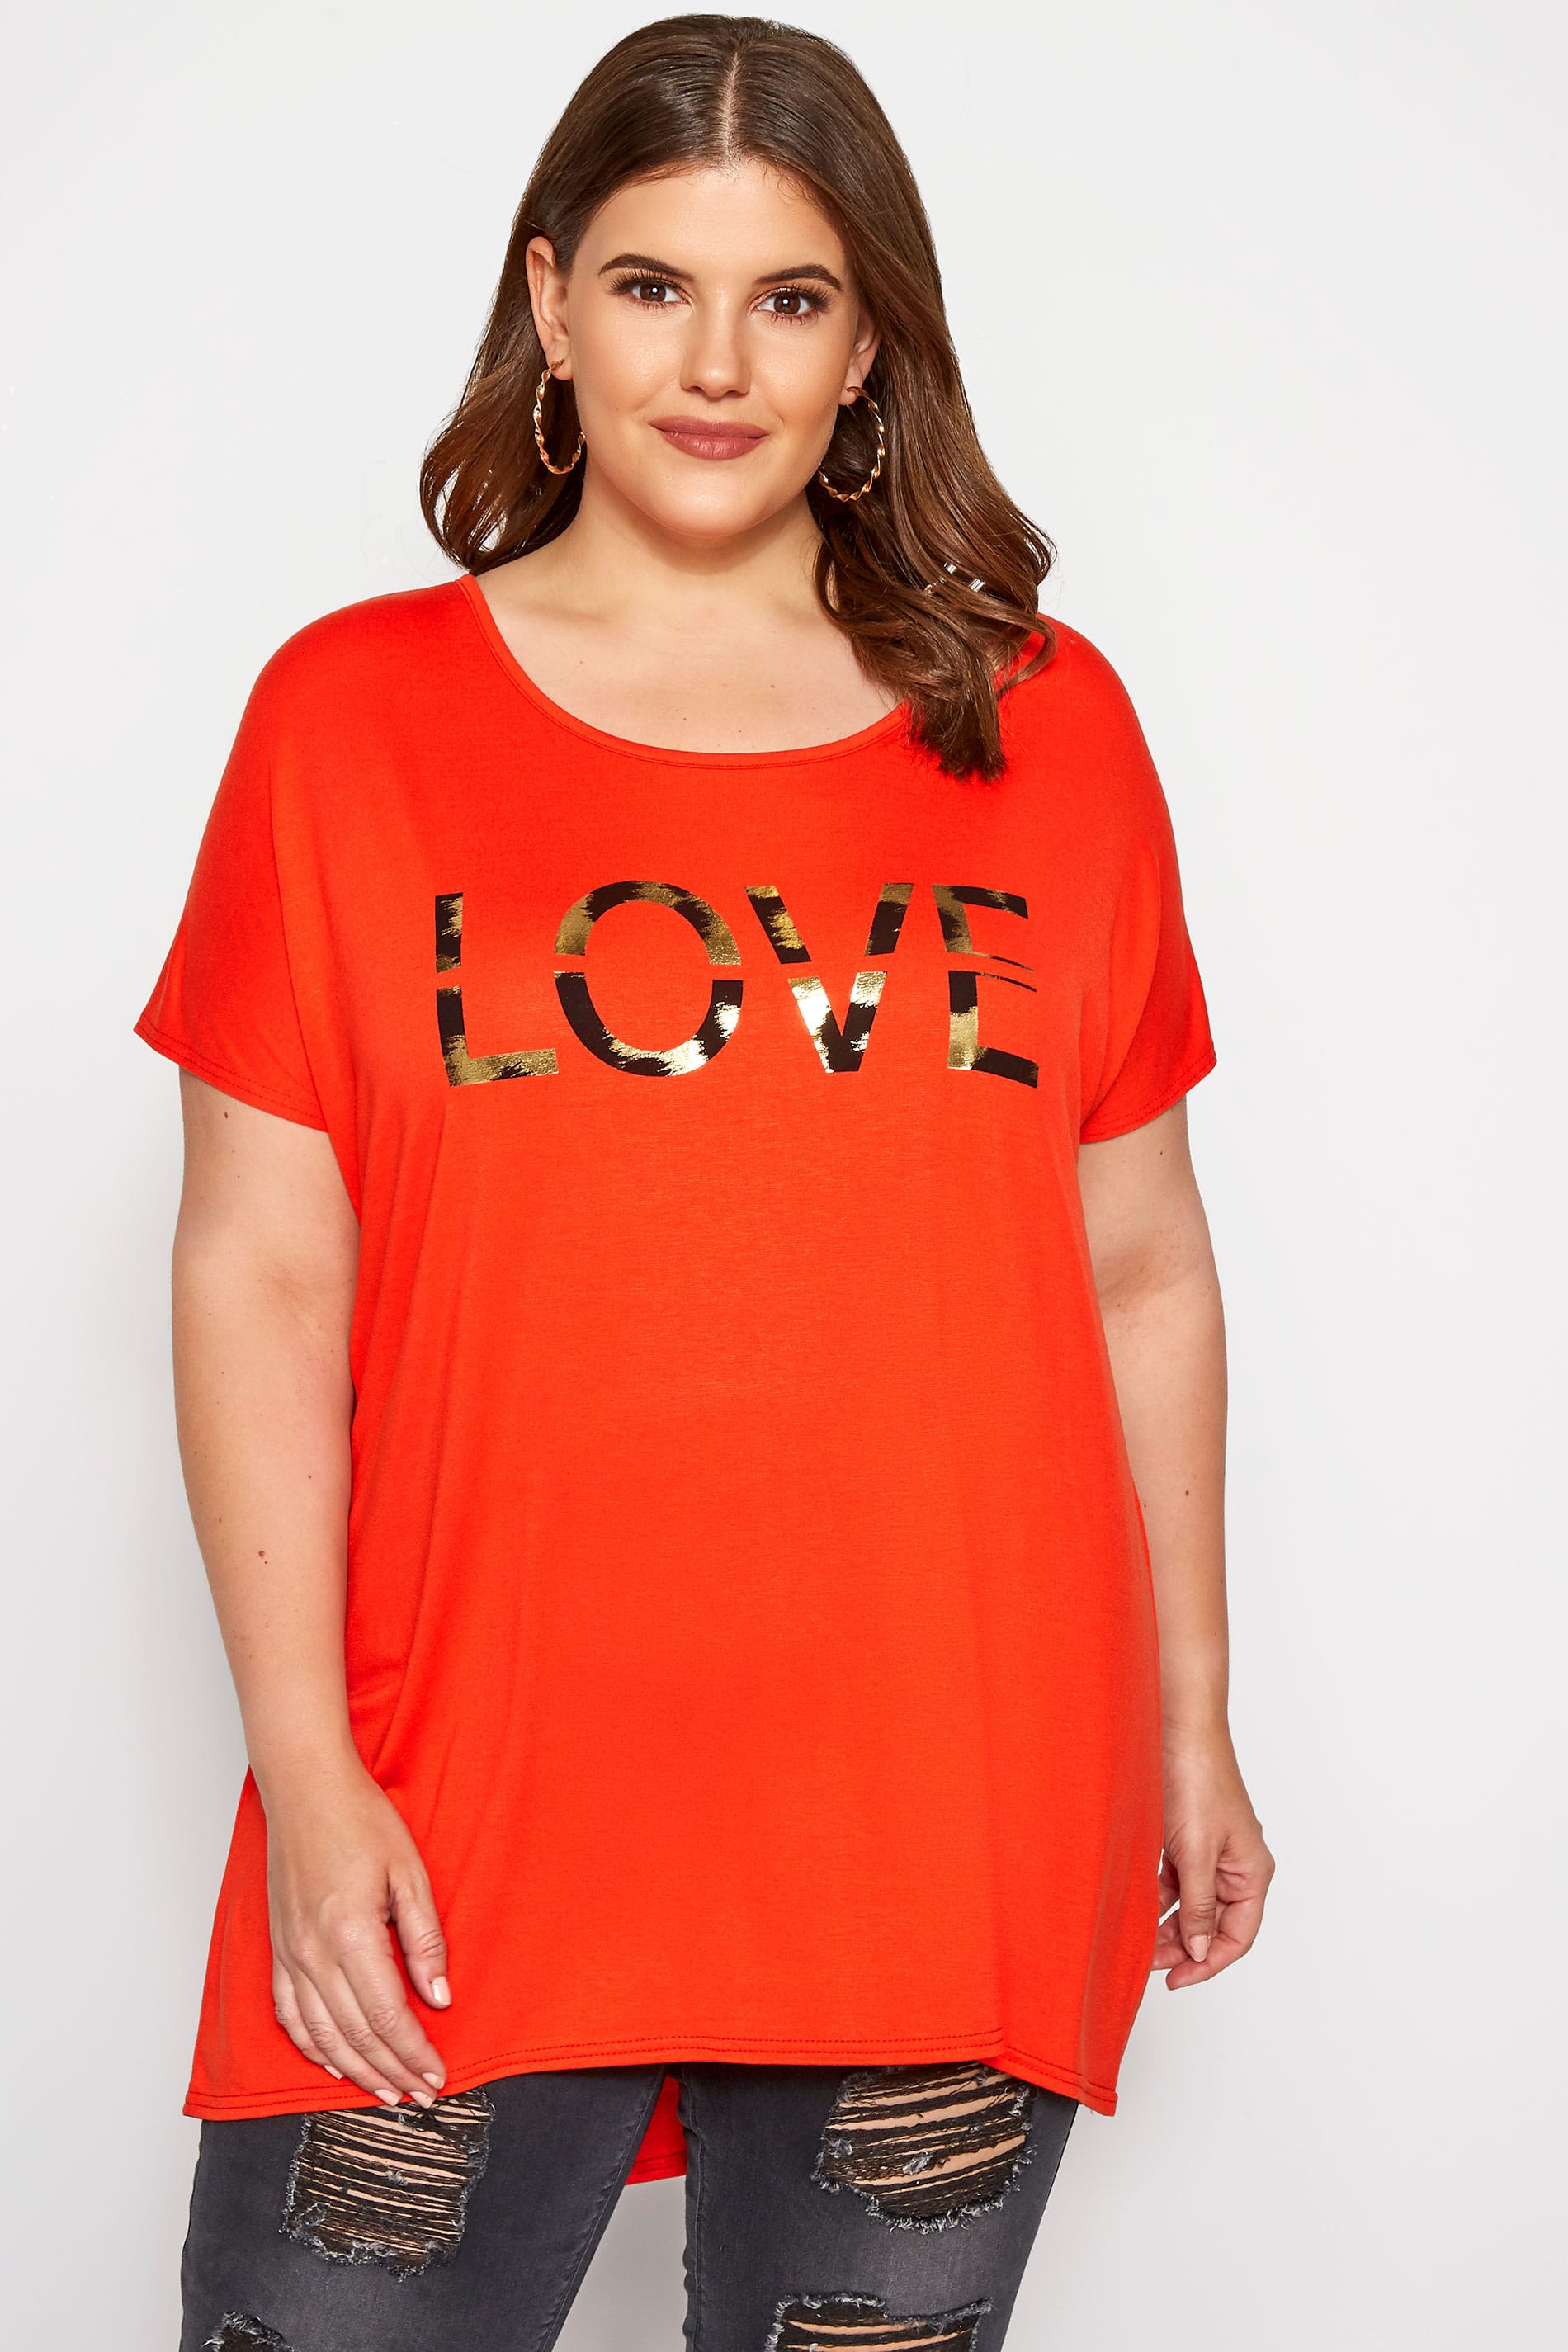 Dark Orange 'Love' Slogan T-Shirt